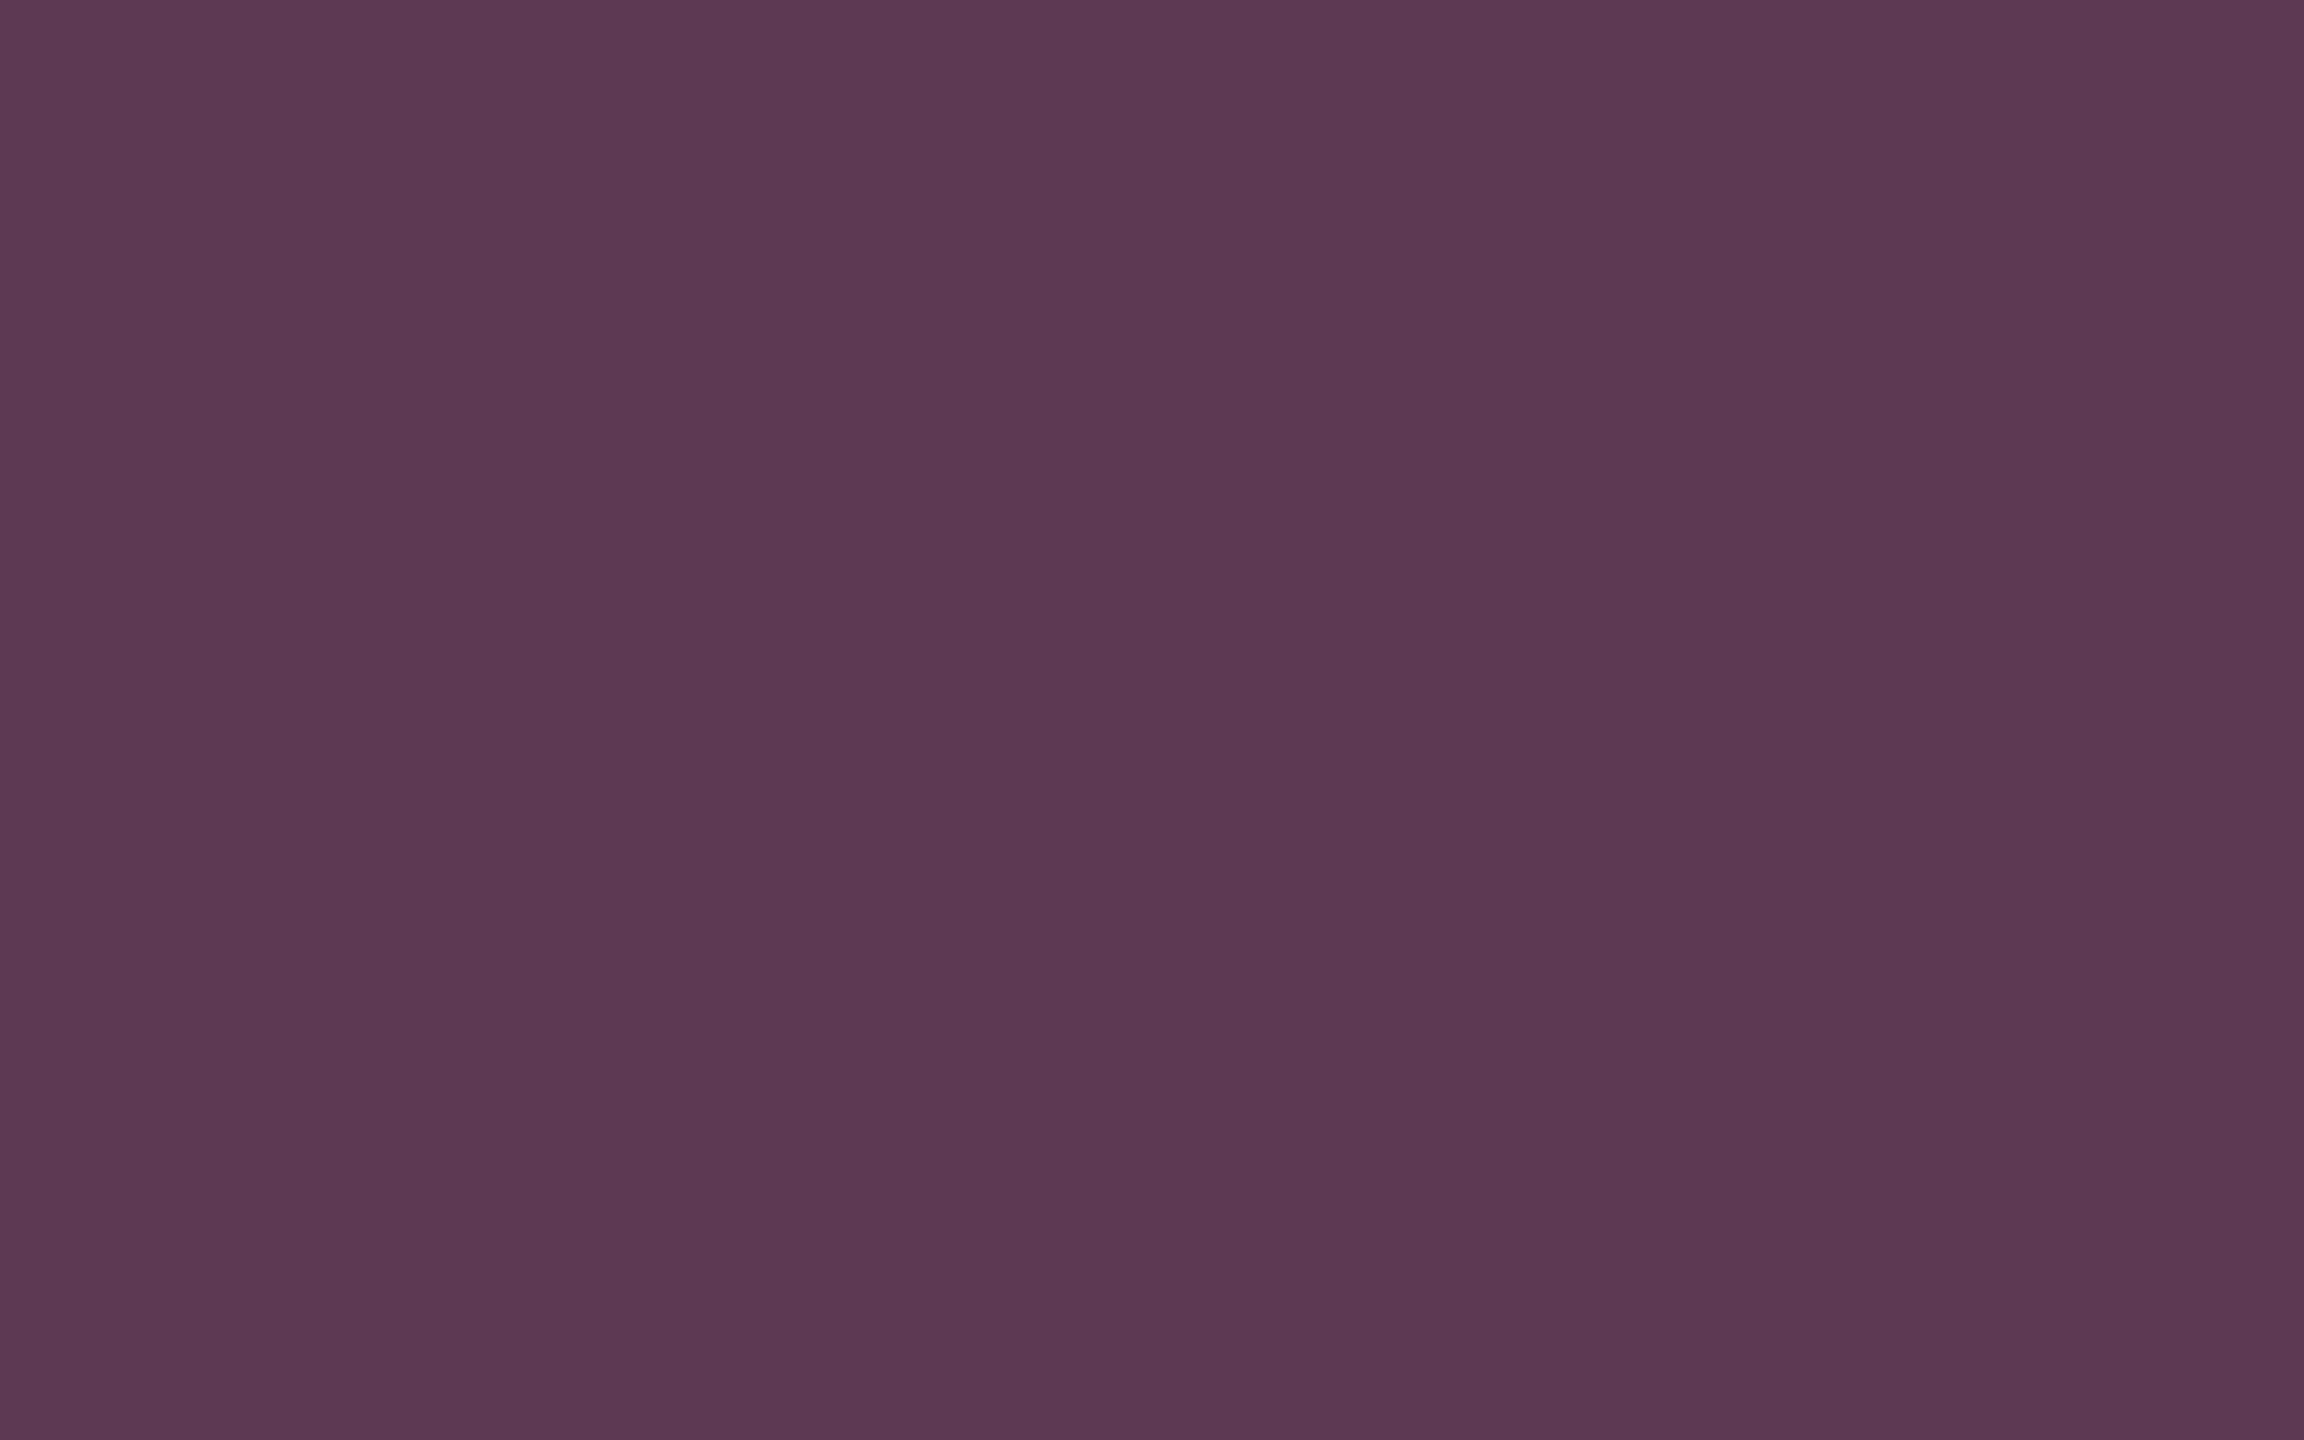 2304x1440 Dark Byzantium Solid Color Background